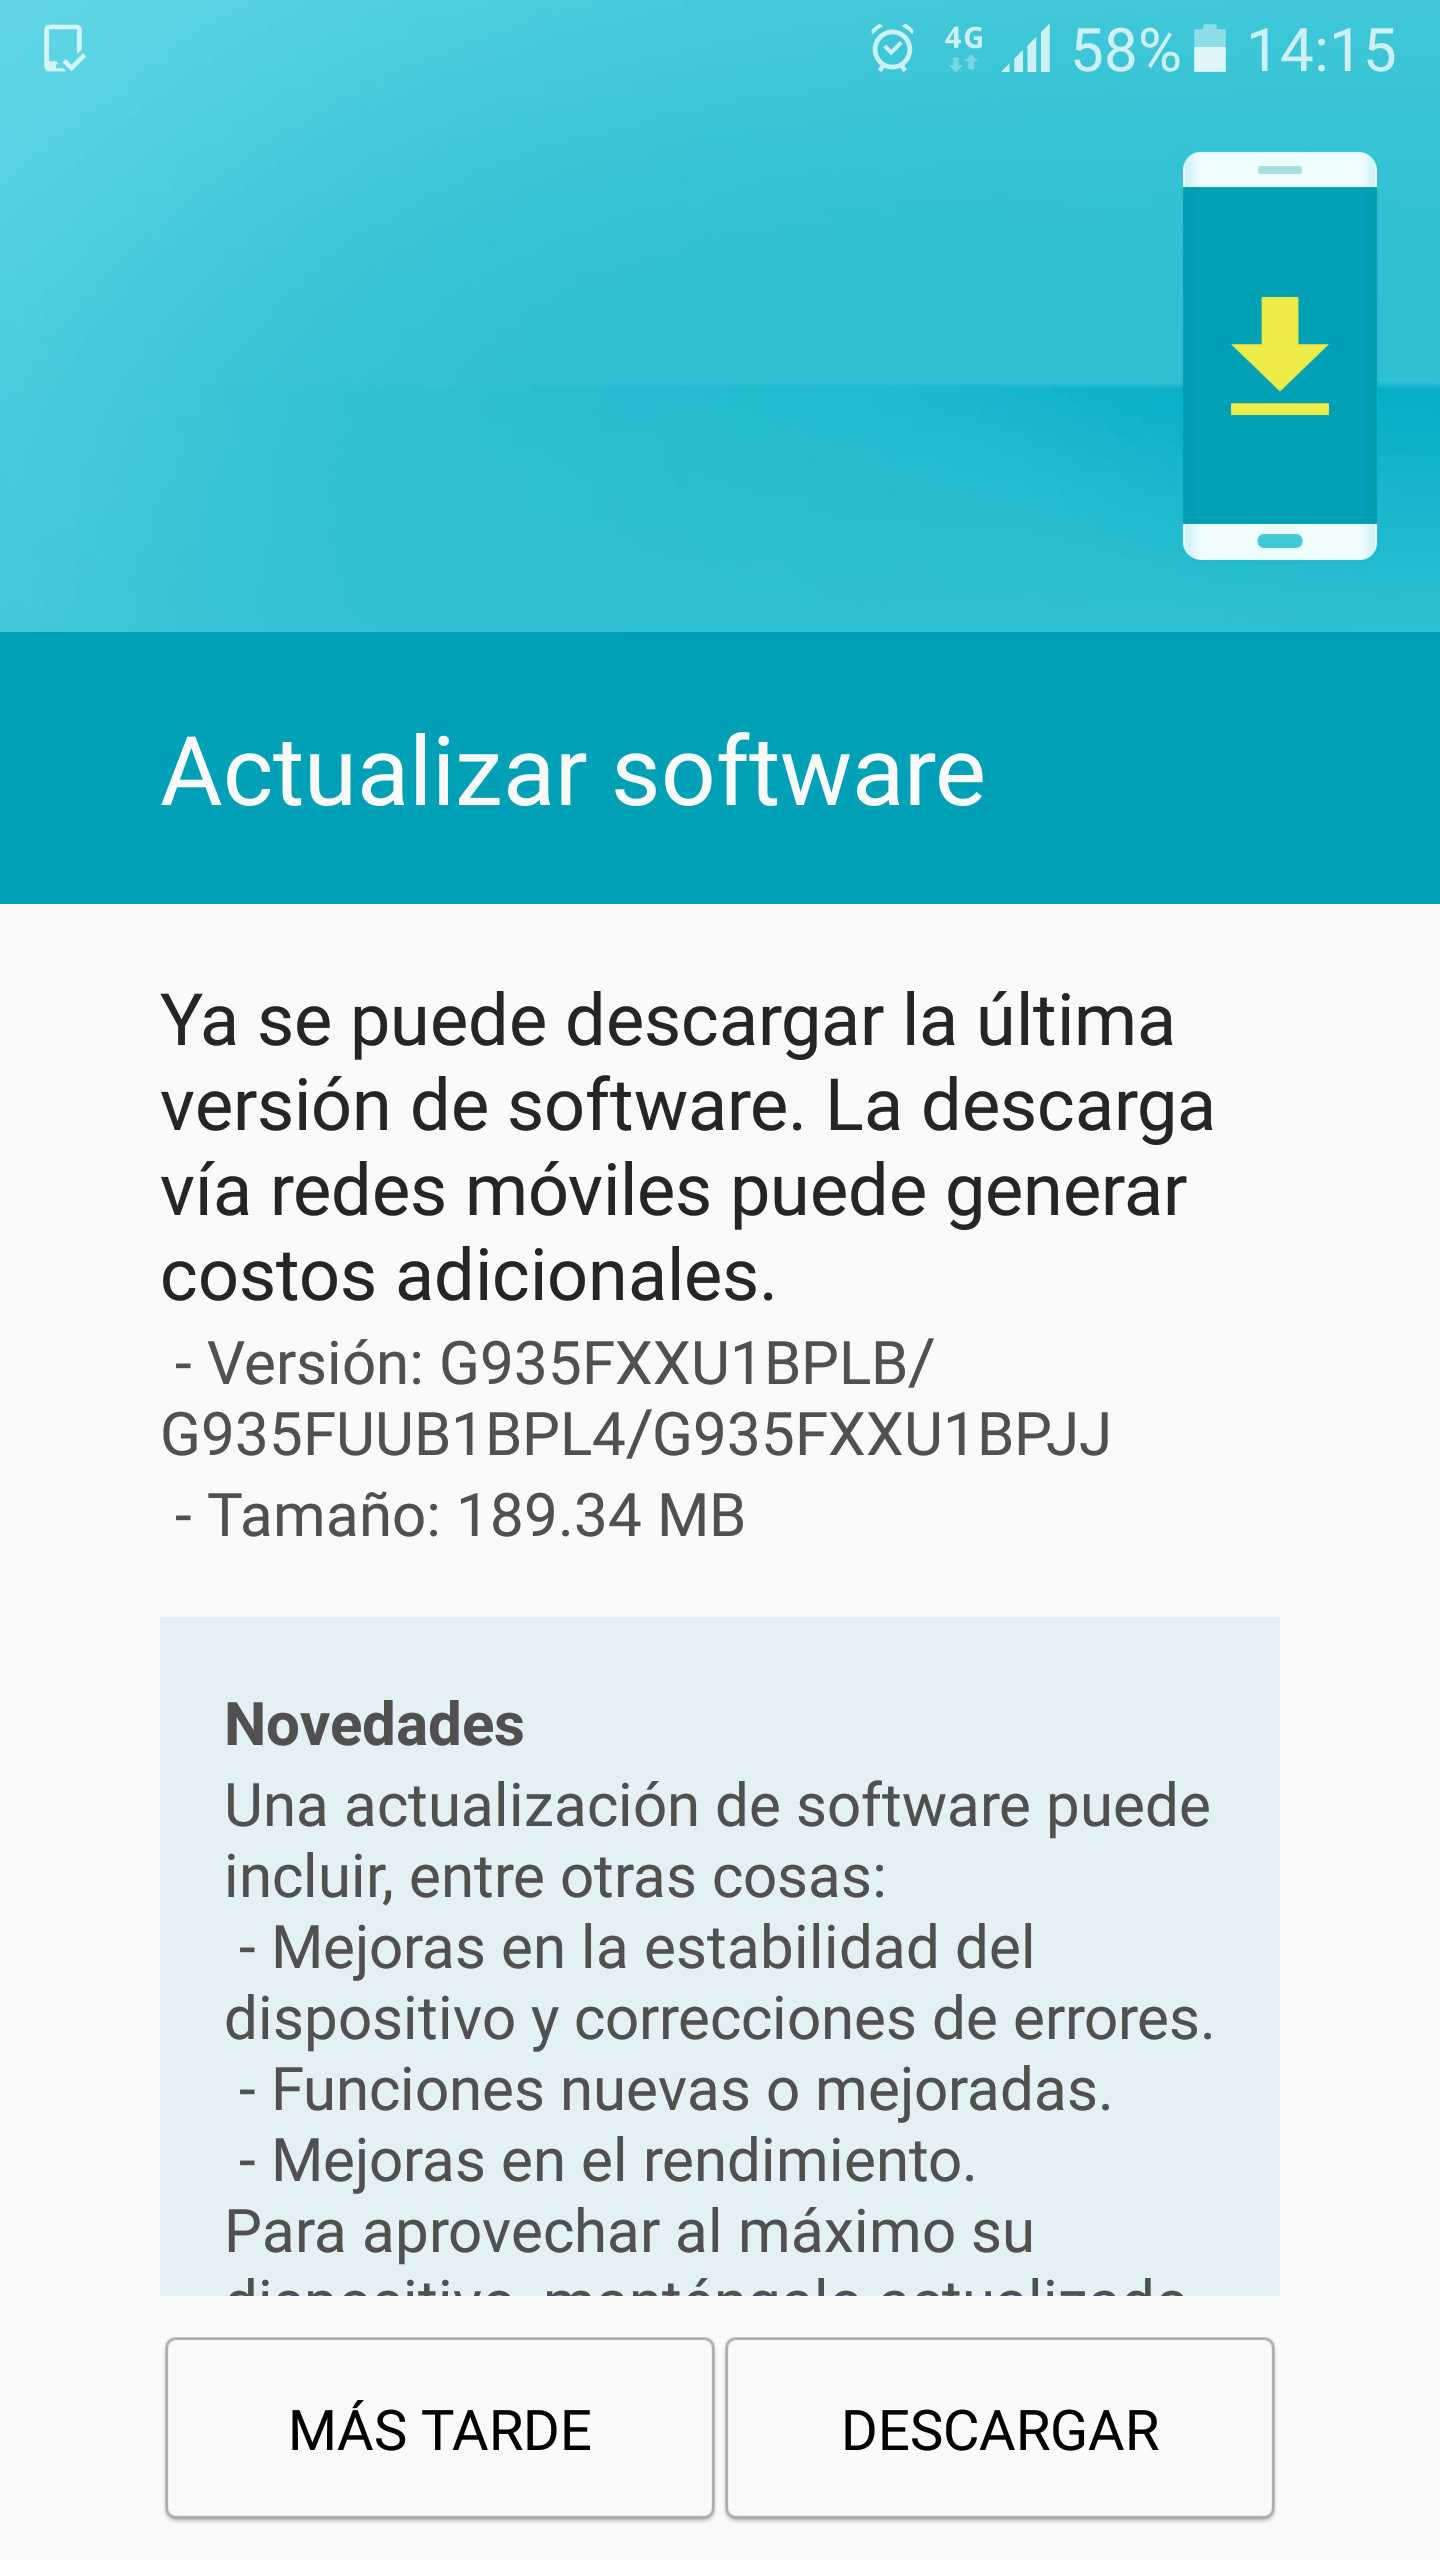 screenshot_20170103-141530